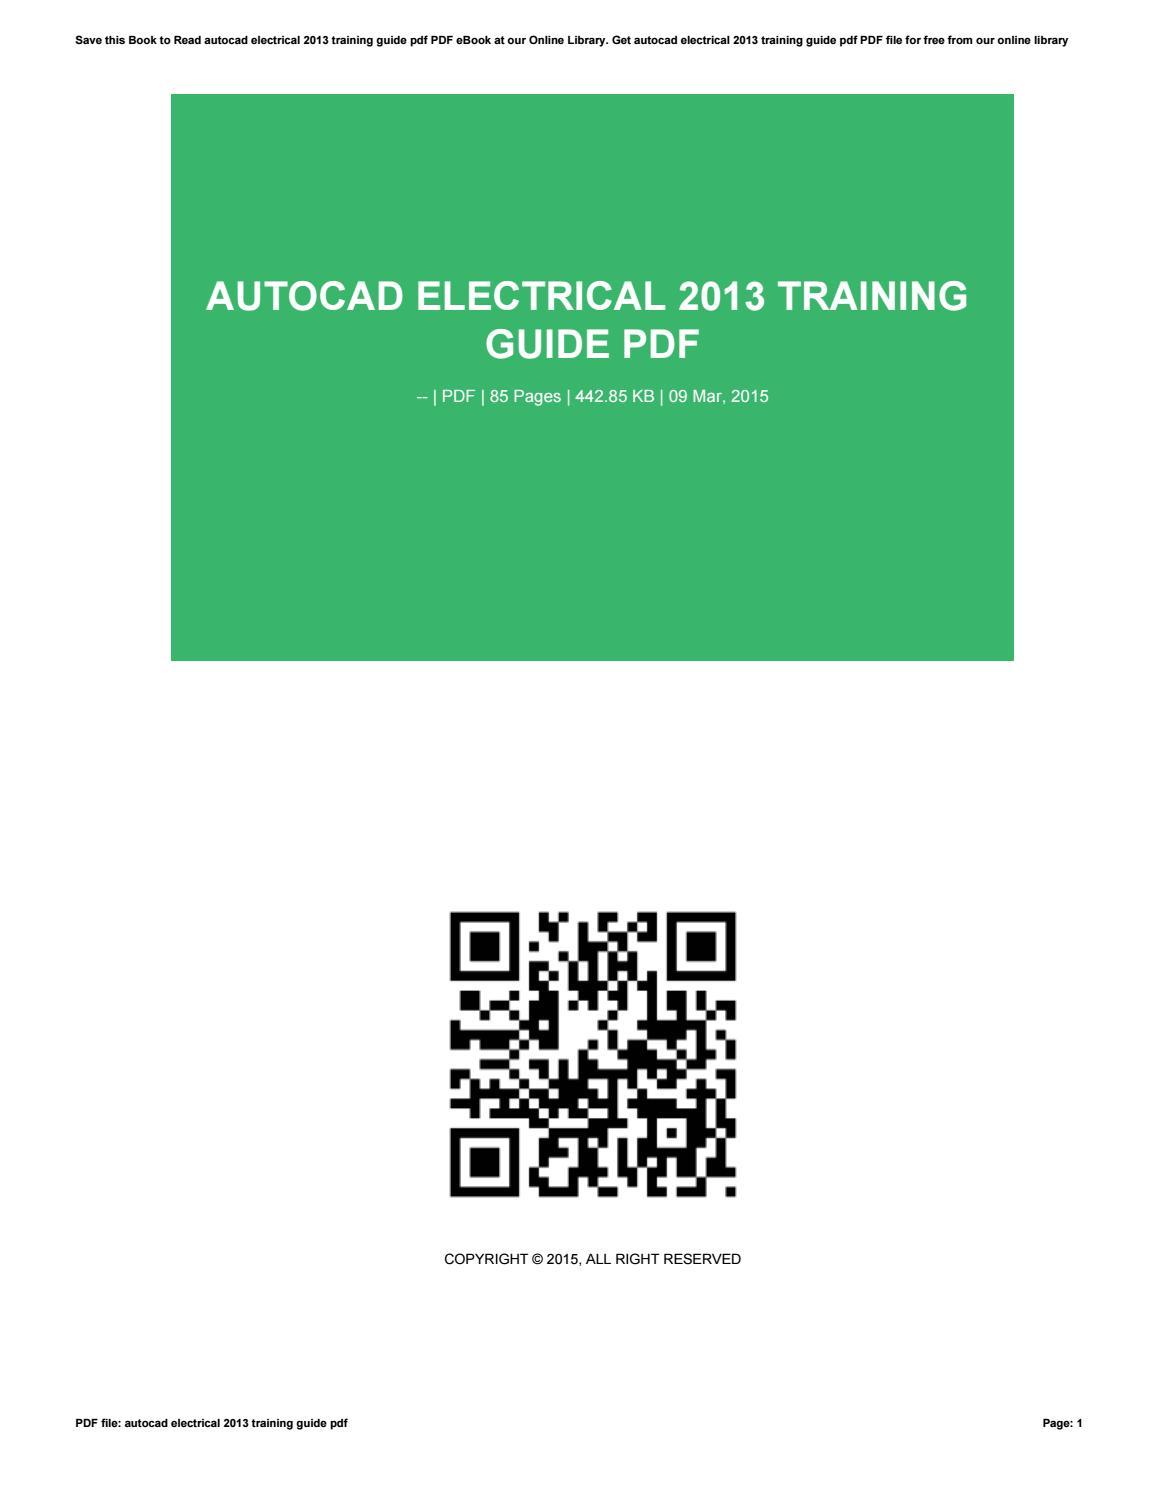 Autocad Guide Book Pdf